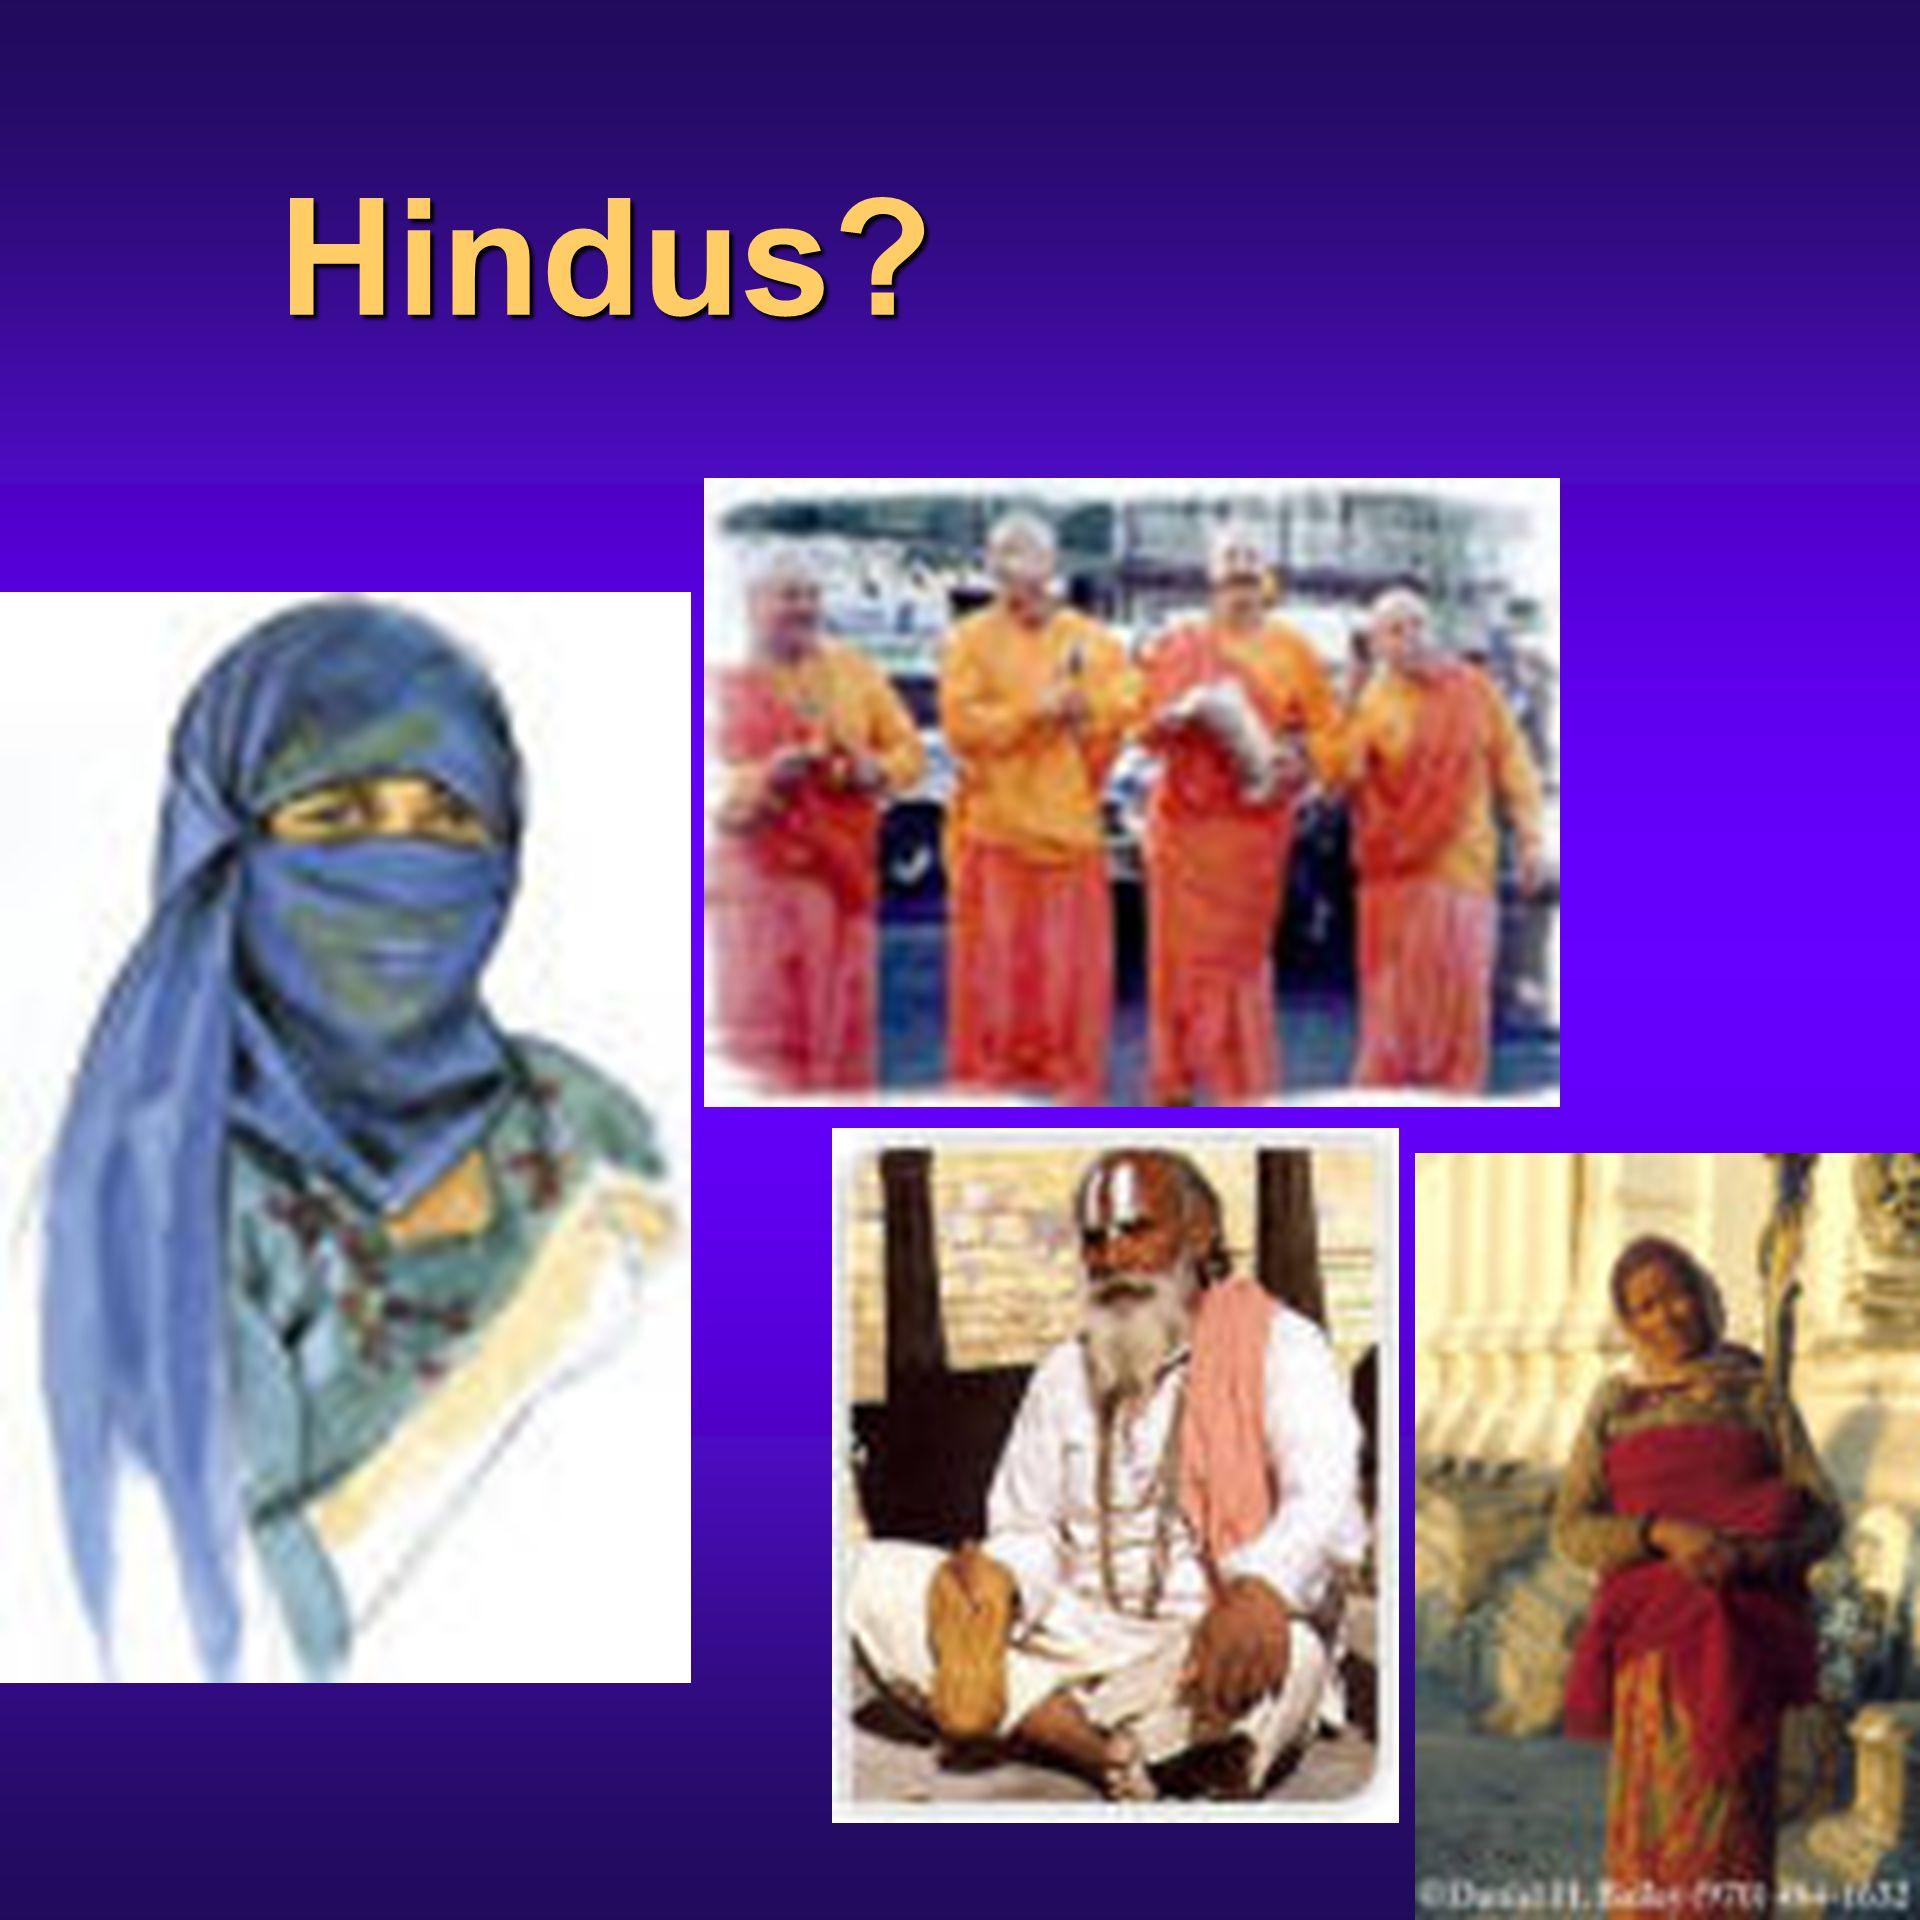 Hindus?